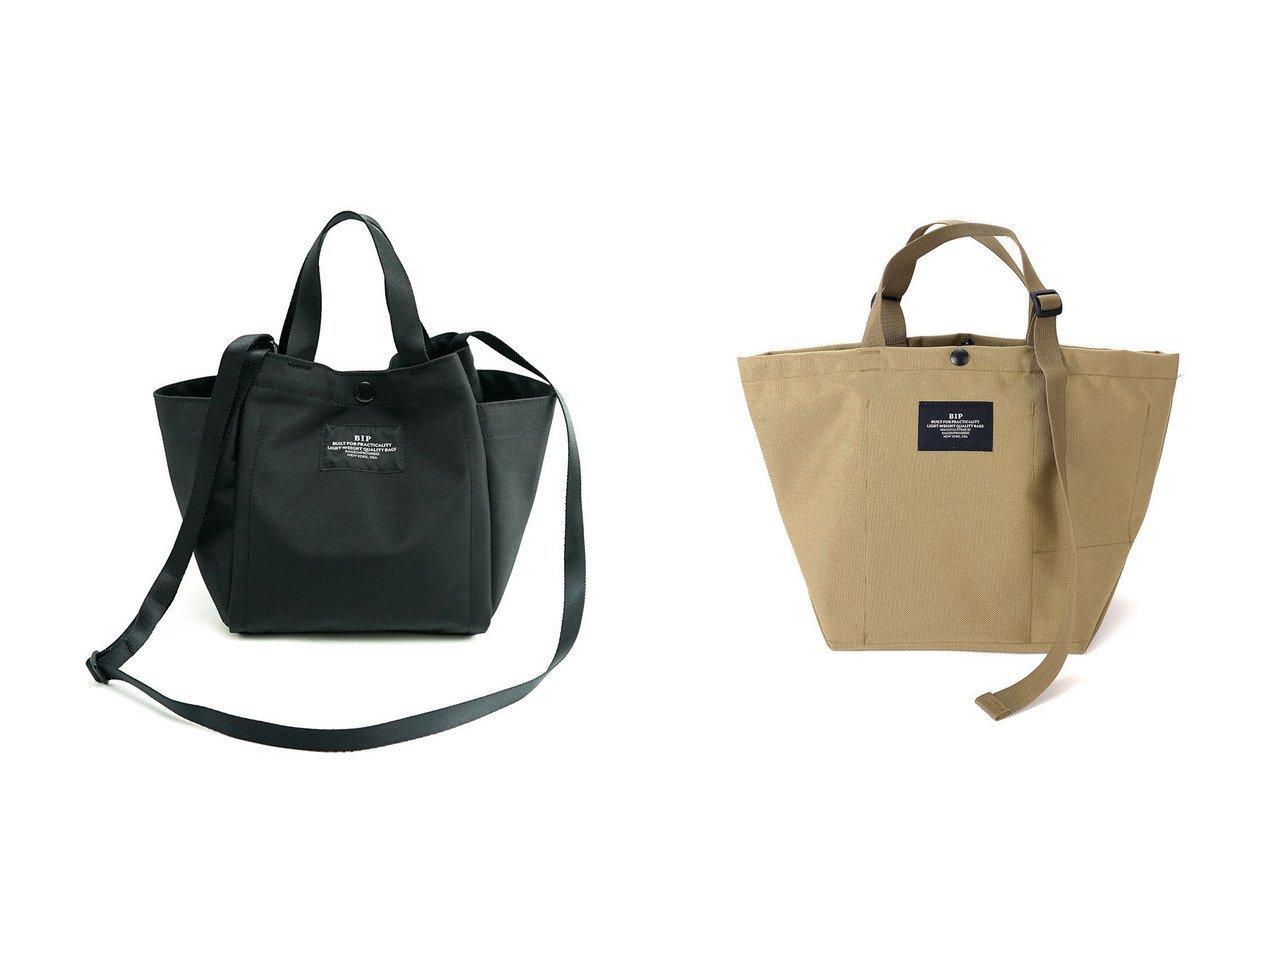 【BAGS IN PROGRESS/バッグス イン プログレス】のSmall Side Pocket トートバッグ&SMALL CARRY-ALL トートバッグ バッグス イン プログレスのおすすめ!人気、トレンド・レディースファッションの通販  おすすめで人気の流行・トレンド、ファッションの通販商品 メンズファッション・キッズファッション・インテリア・家具・レディースファッション・服の通販 founy(ファニー) https://founy.com/ ファッション Fashion レディースファッション WOMEN バッグ Bag 2021年 2021 2021 春夏 S/S SS Spring/Summer 2021 S/S 春夏 SS Spring/Summer シンプル トラベル ポケット 春 Spring |ID:crp329100000021160